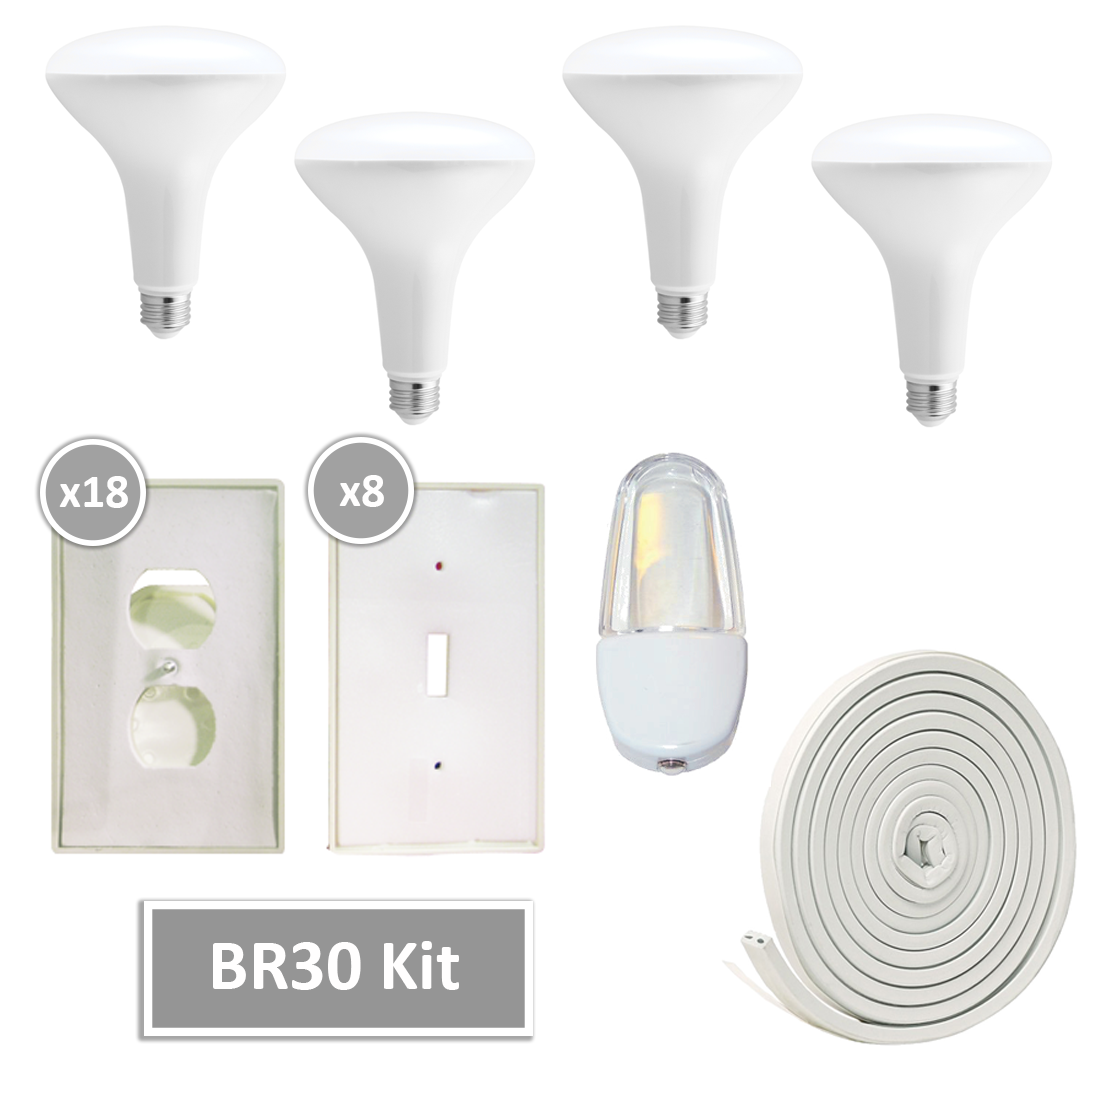 BR30 LED Kit